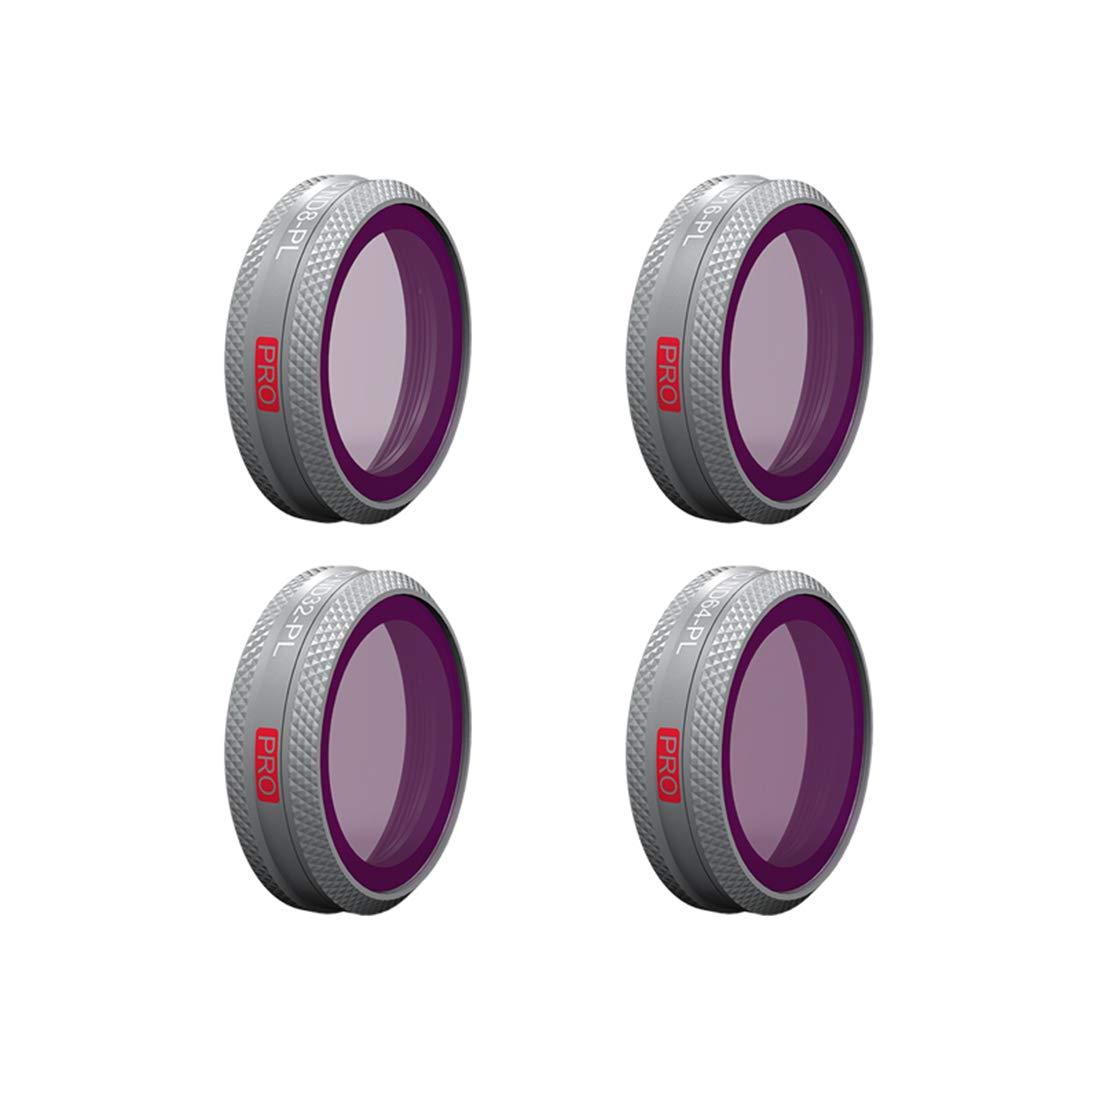 Filtro Lokauf Dji Filtri Accessori Pgytech 4 Ndpl Per Pezzi Kit tshQdxrC